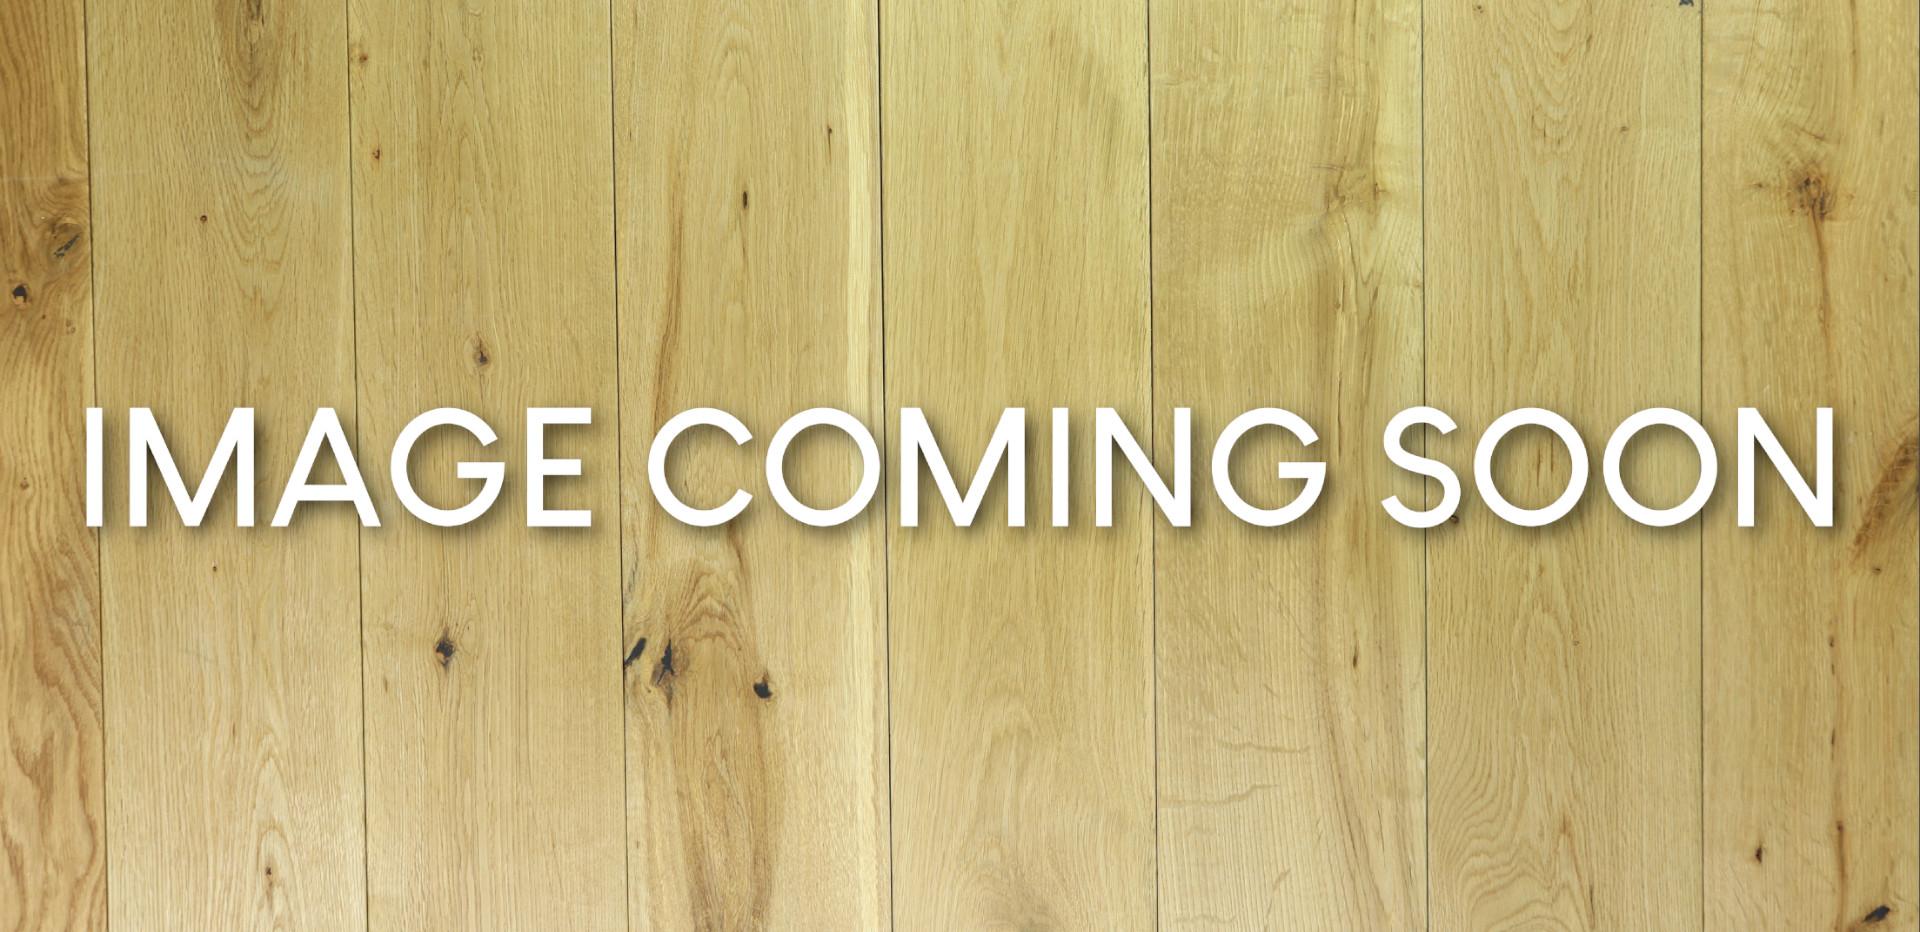 Fender Custom Shop #11 Dual Mag II Strat Heavy Relic Aztec Gold over 3 Tone Sunburst CZ548416 ~ Coming Soon!